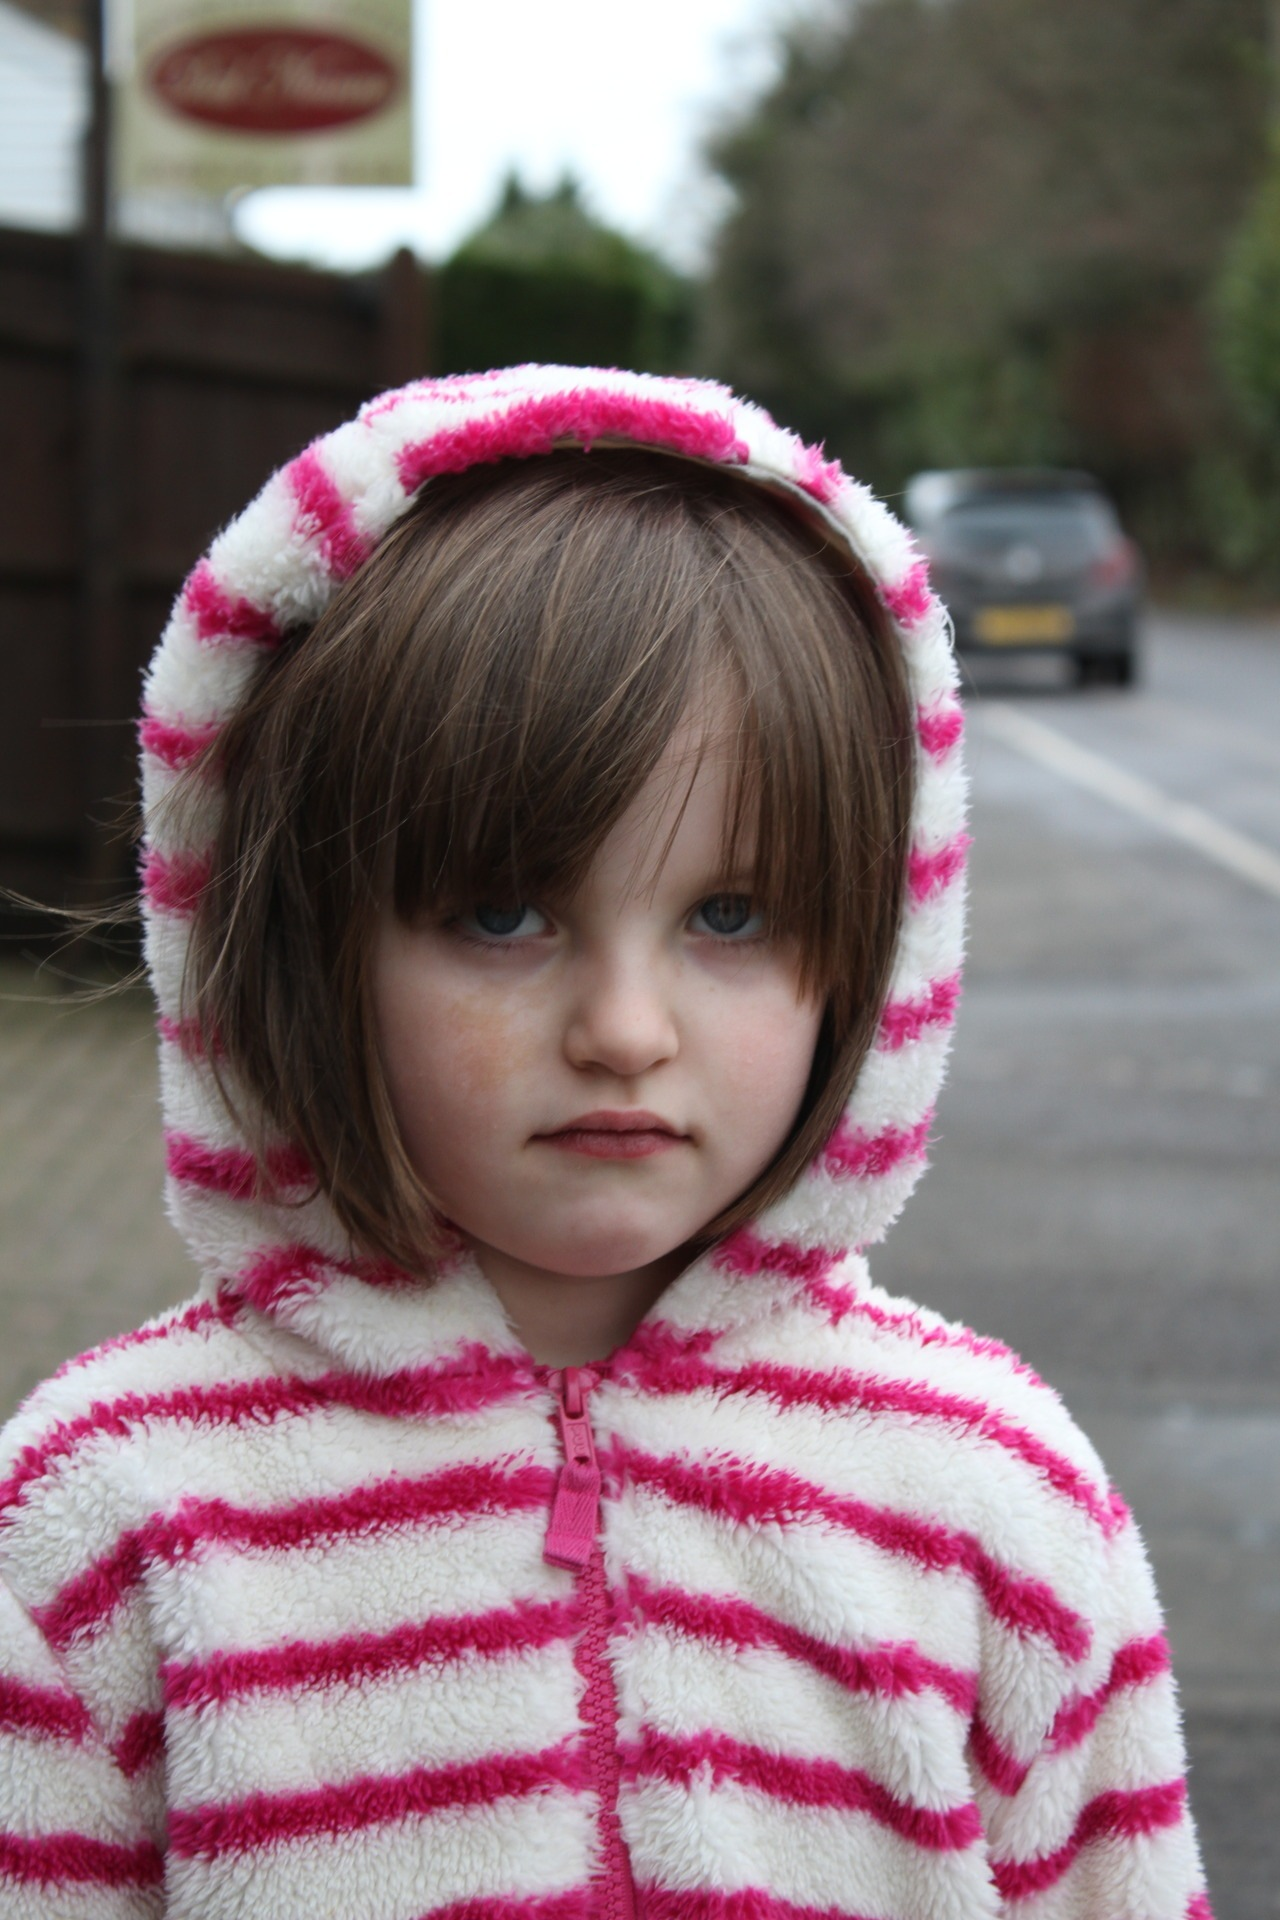 Grumpy Face  by Poppy May Mccollum